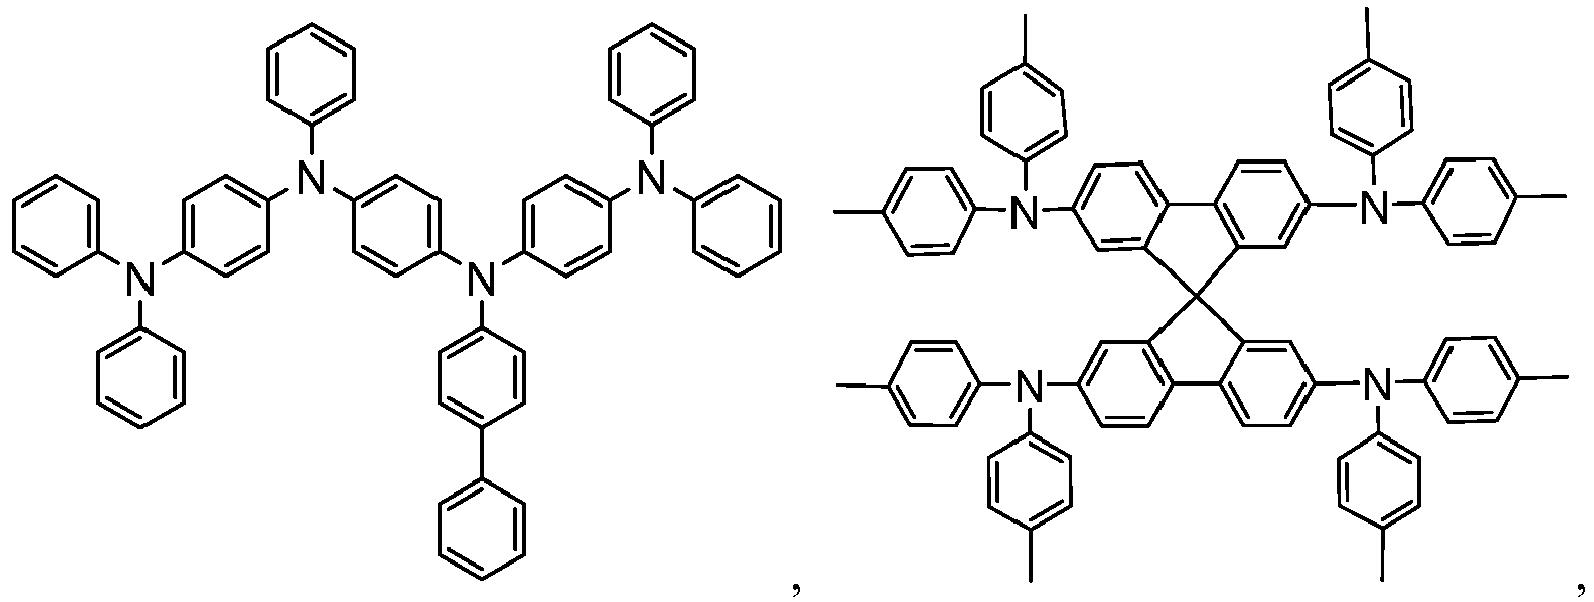 Figure imgb0845